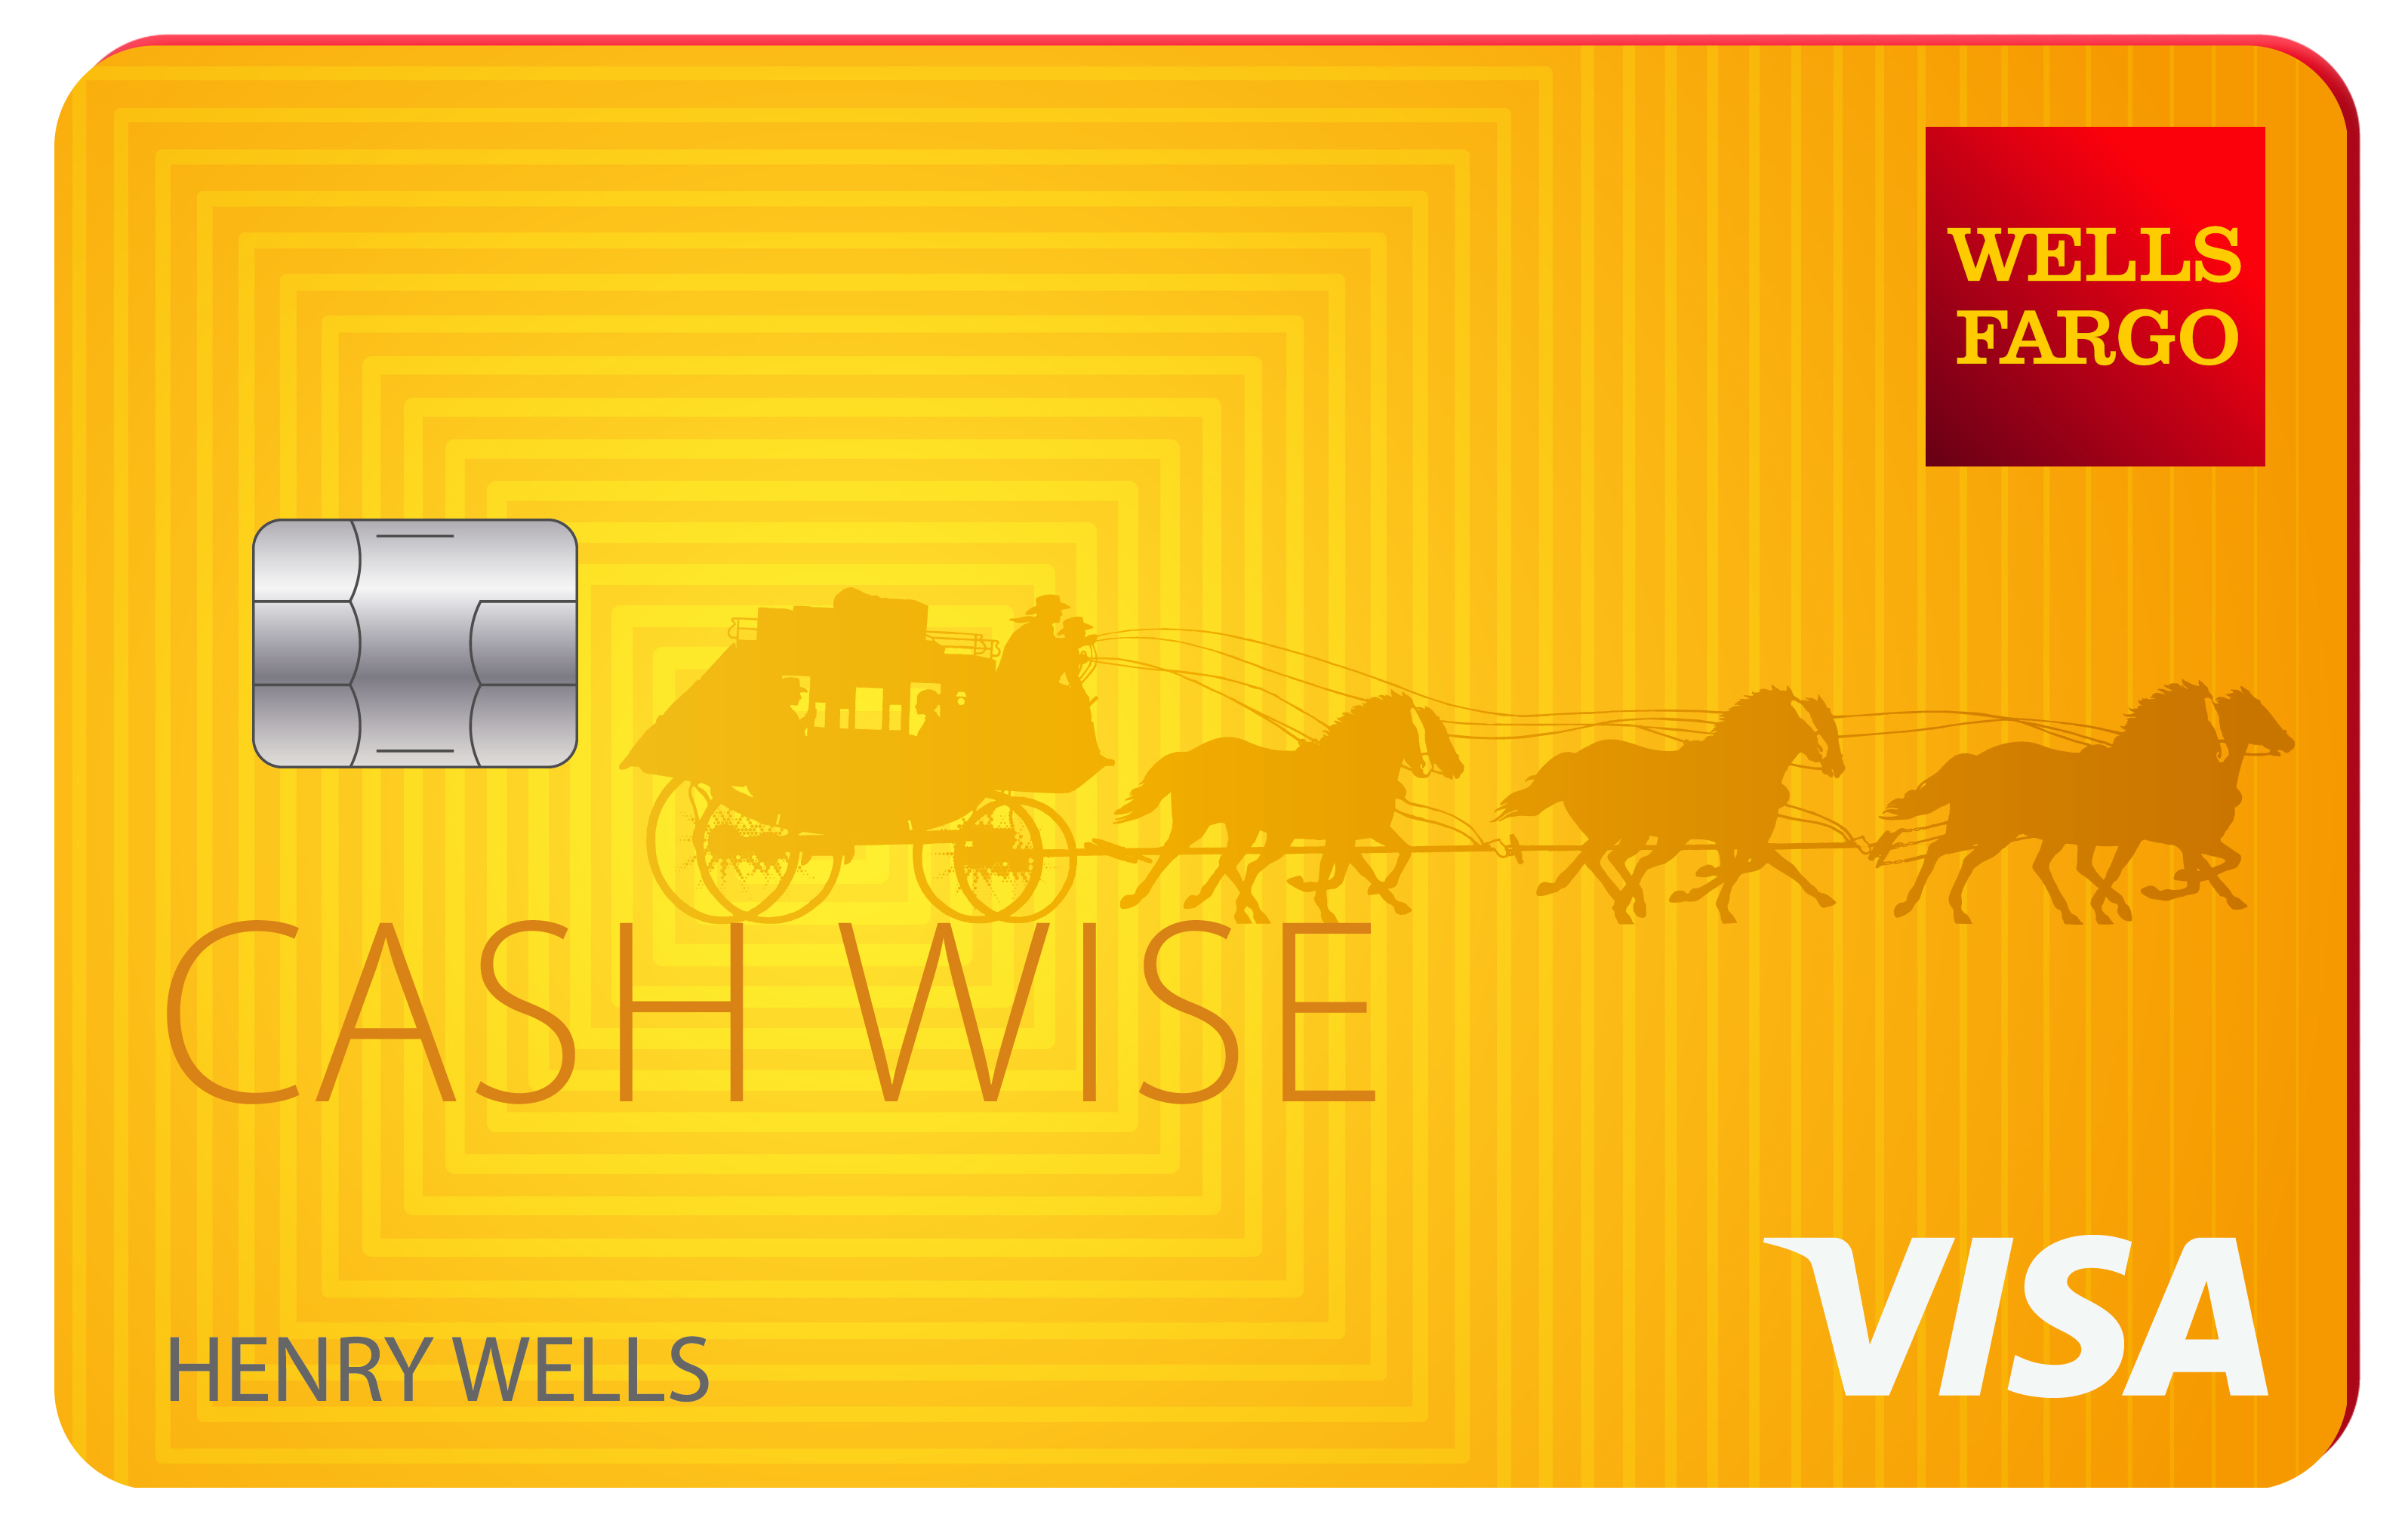 wells fargo cash wise visacard reviews